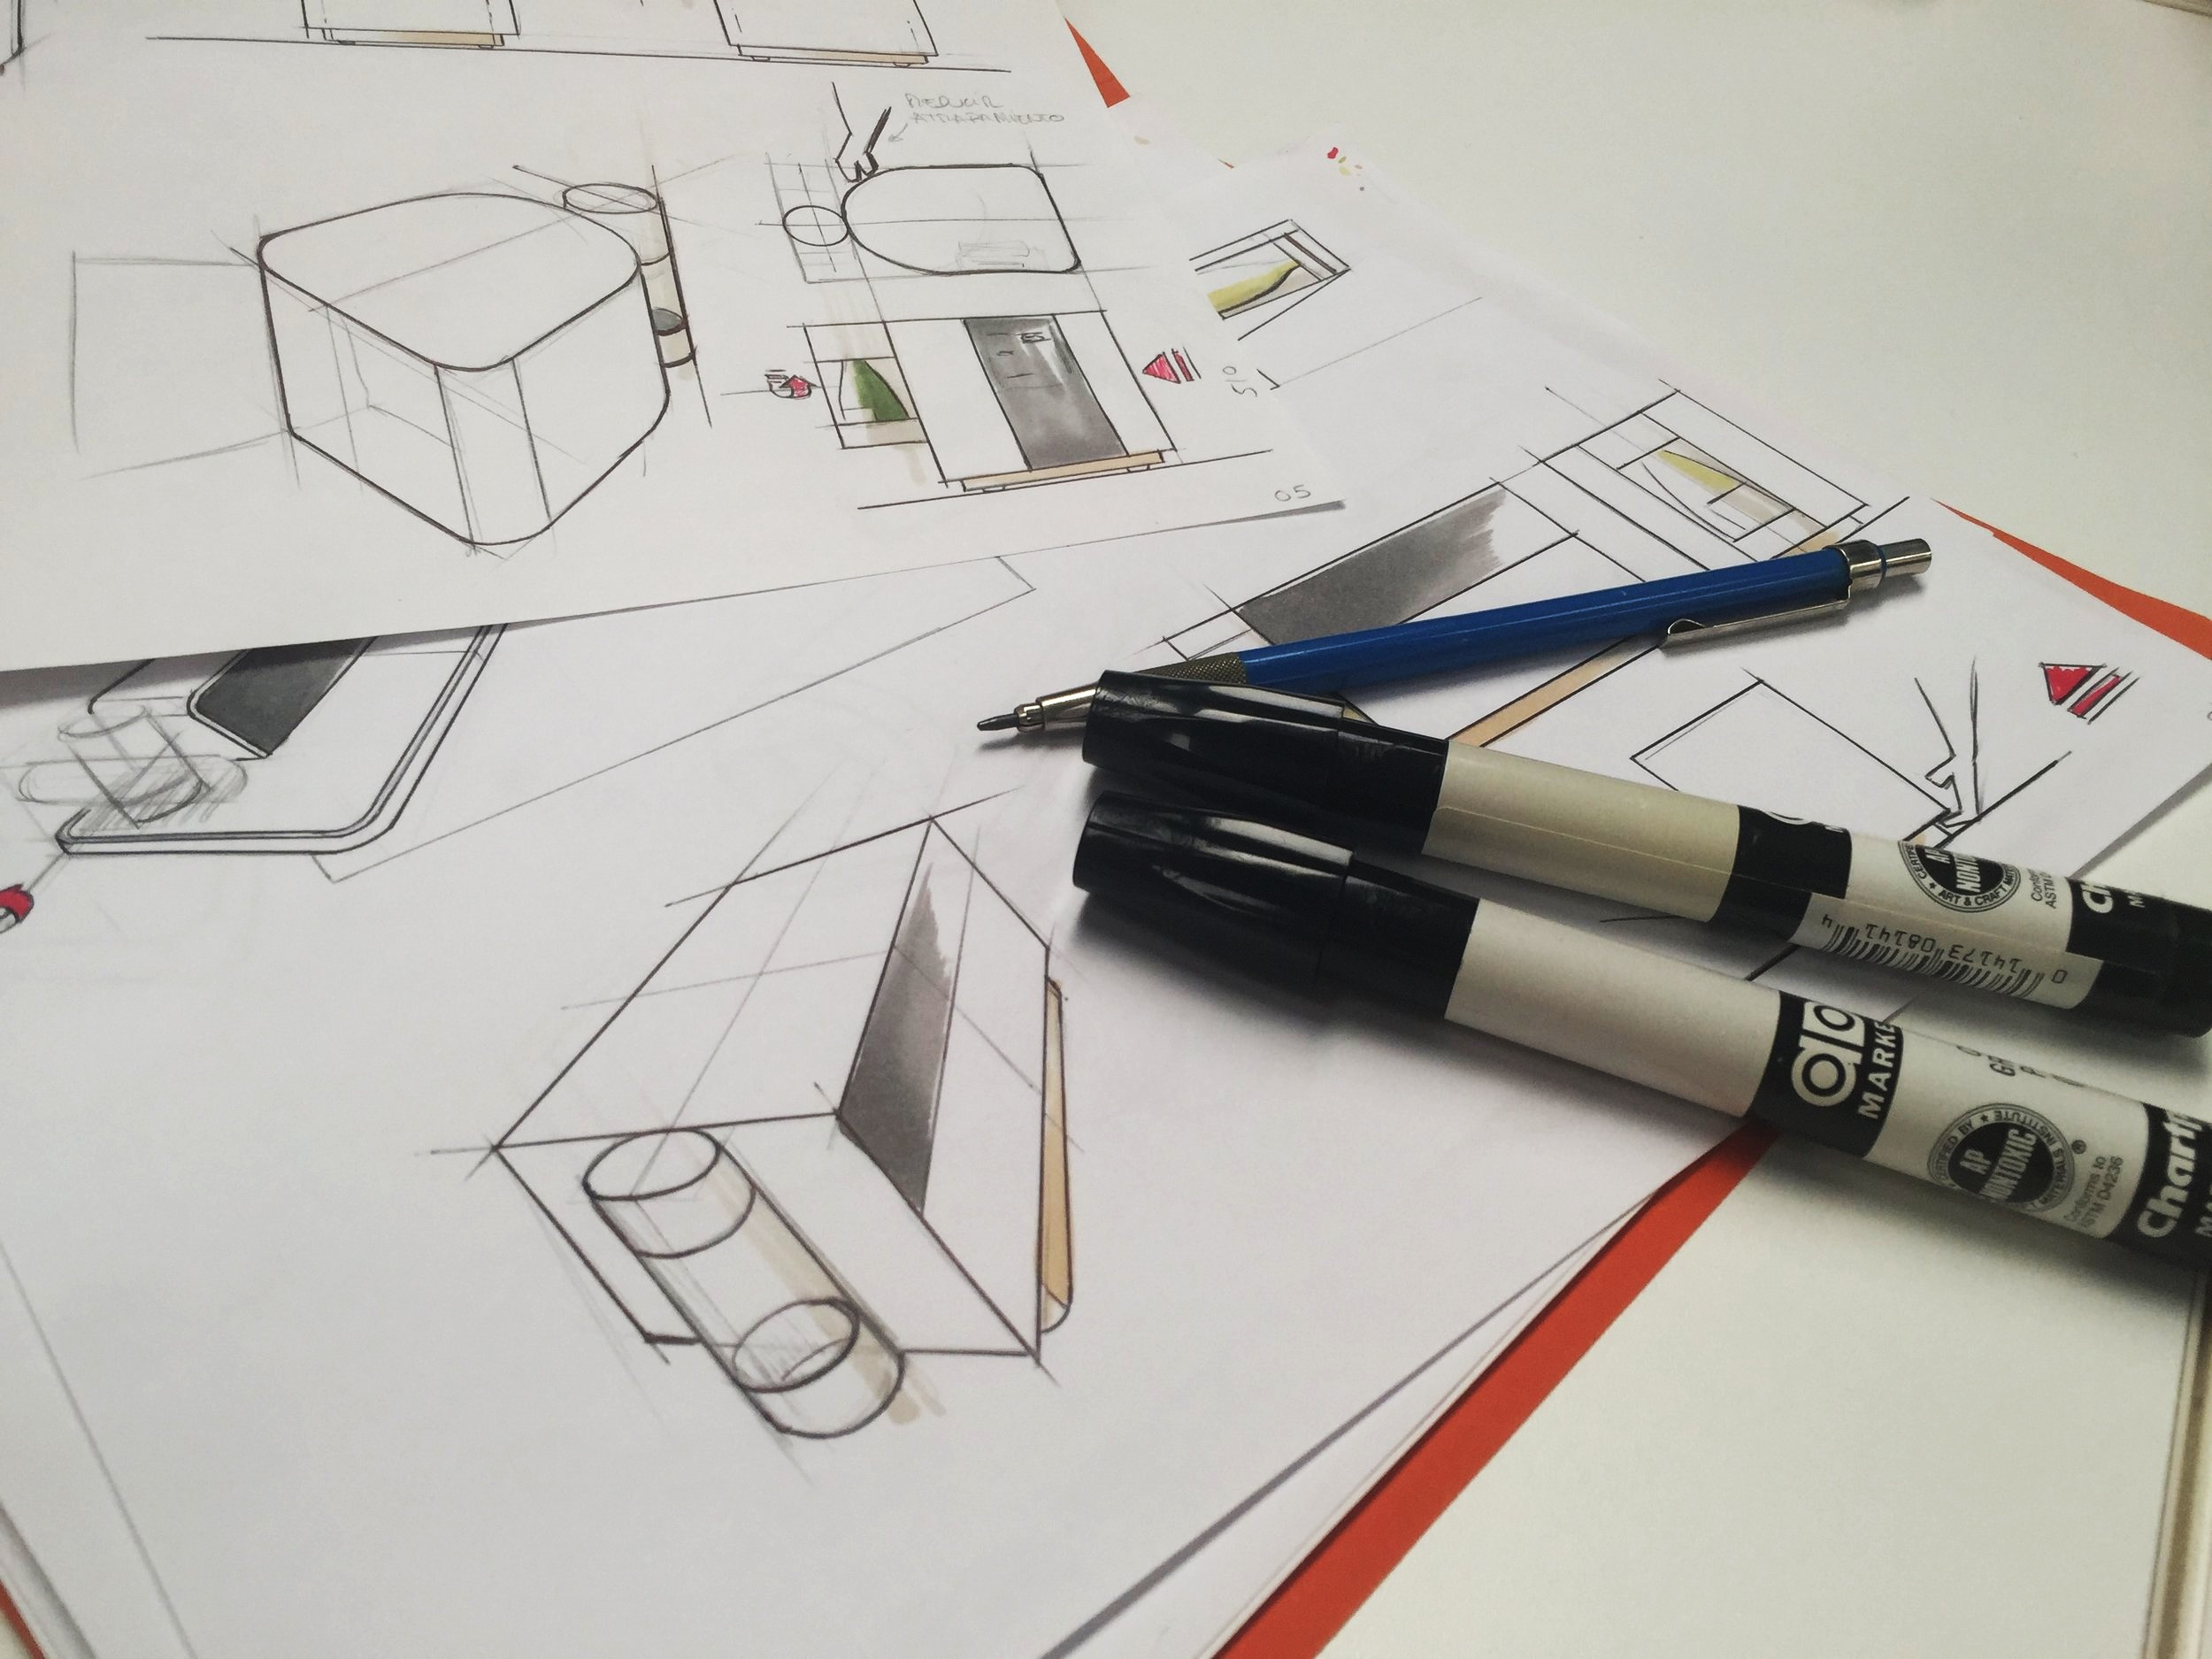 AlacarteVentures_concepts